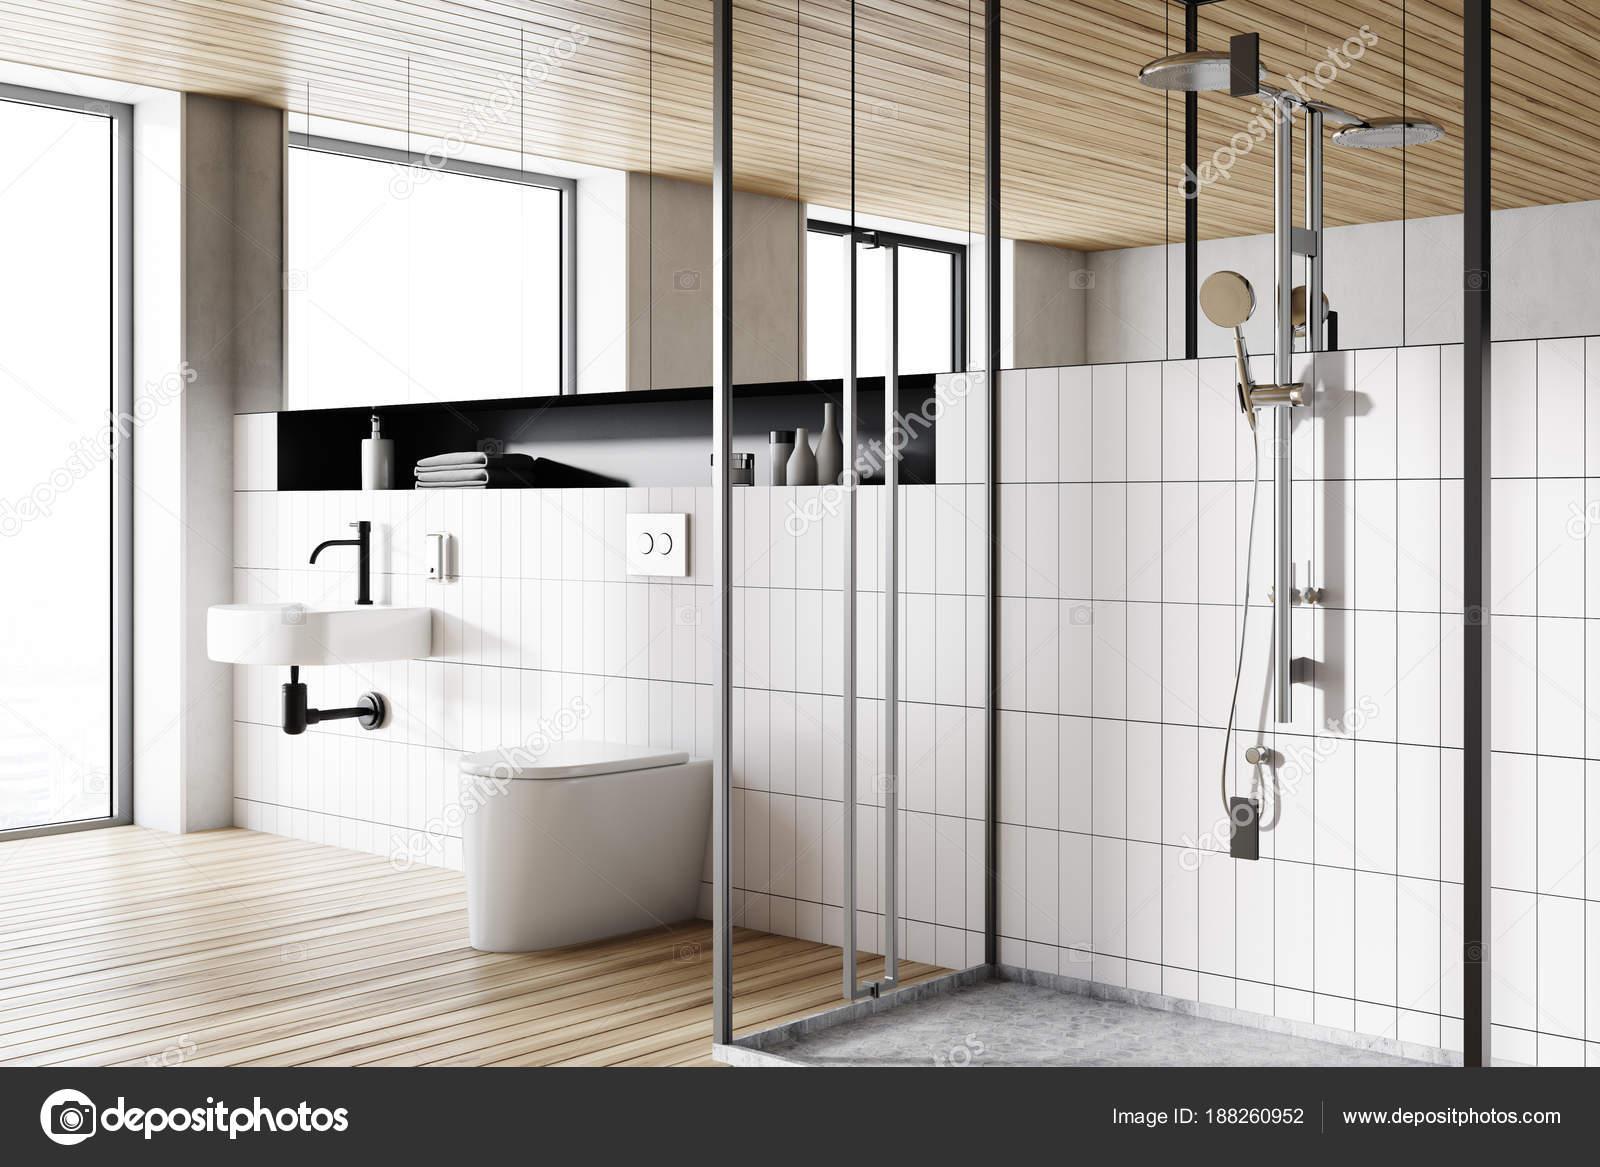 Houten plafond badkamer interieur zijaanzicht — Stockfoto ...